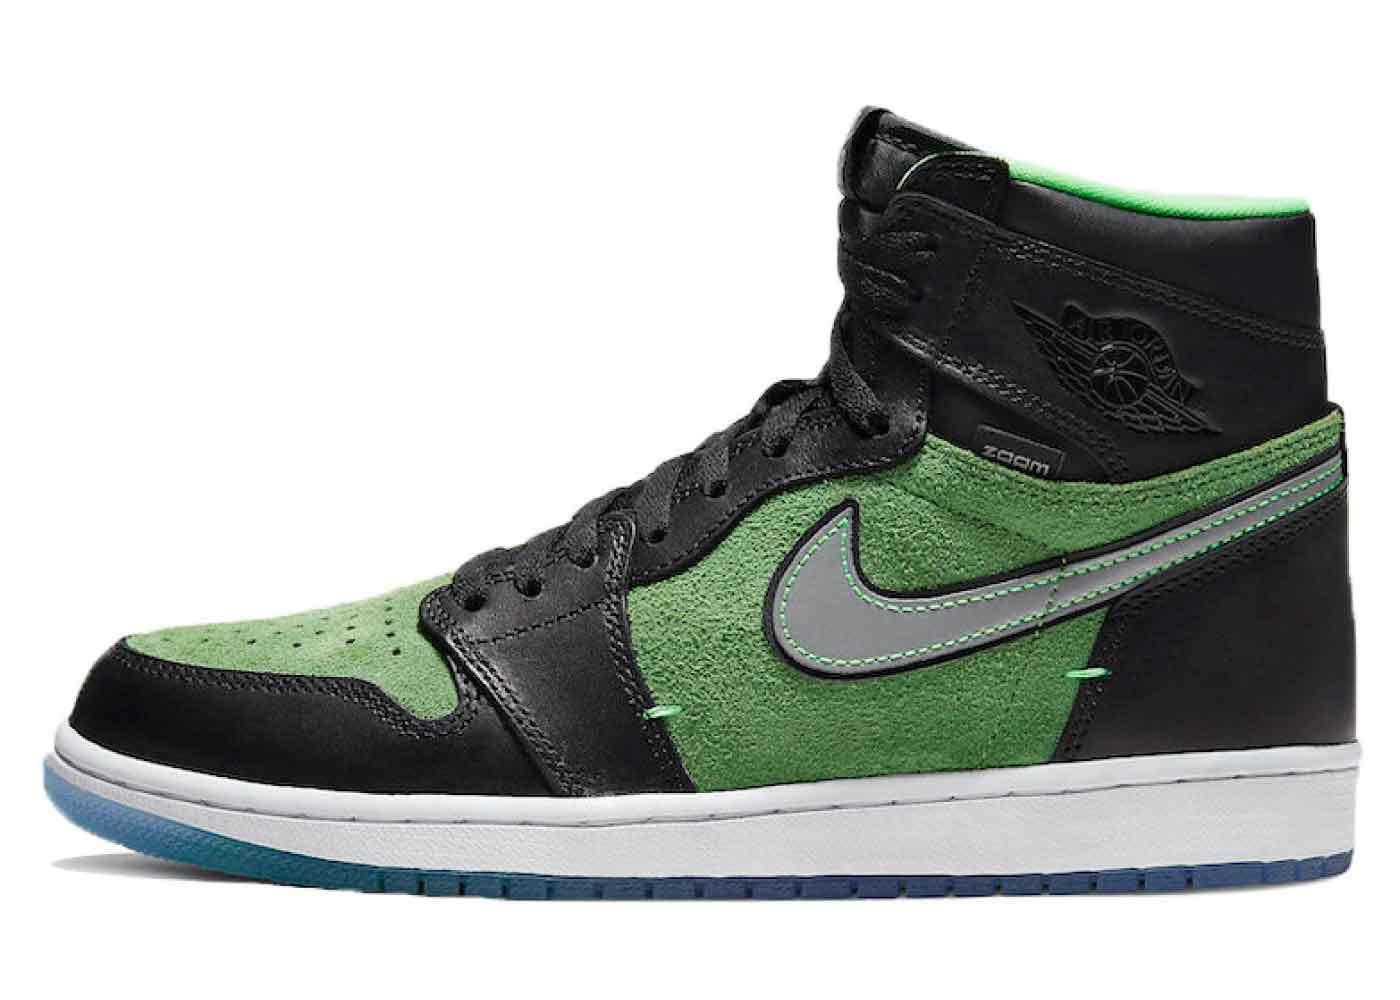 Nike Air Jordan 1 High Zoom Rage Greenの写真